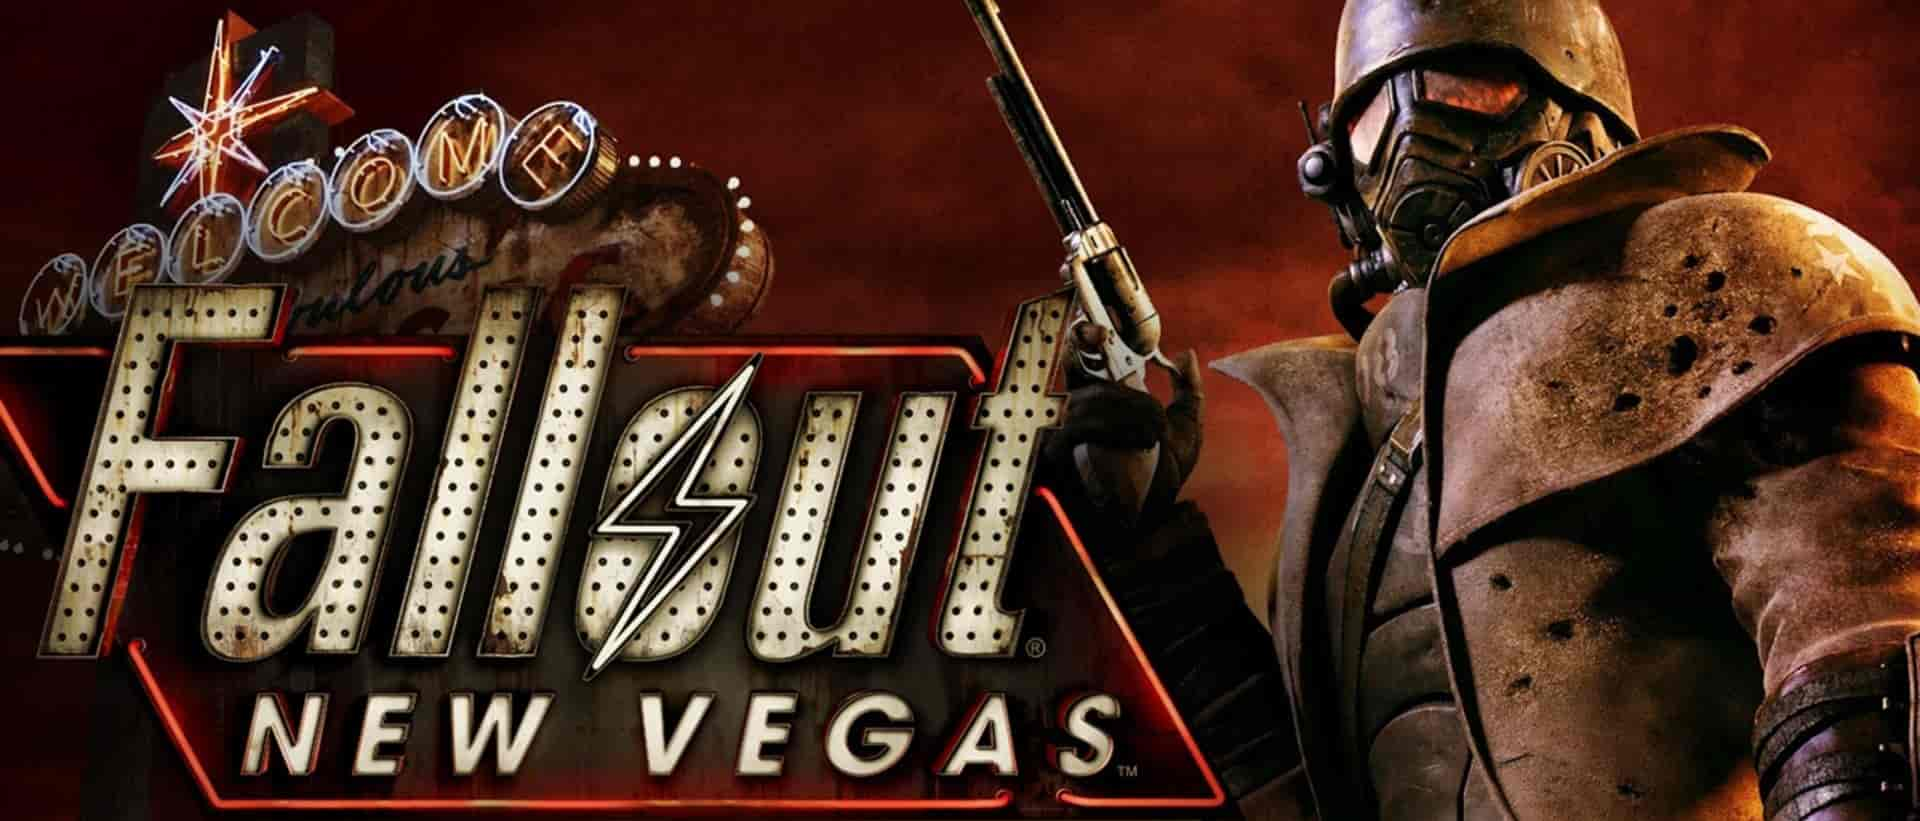 fallout new vegas title screen